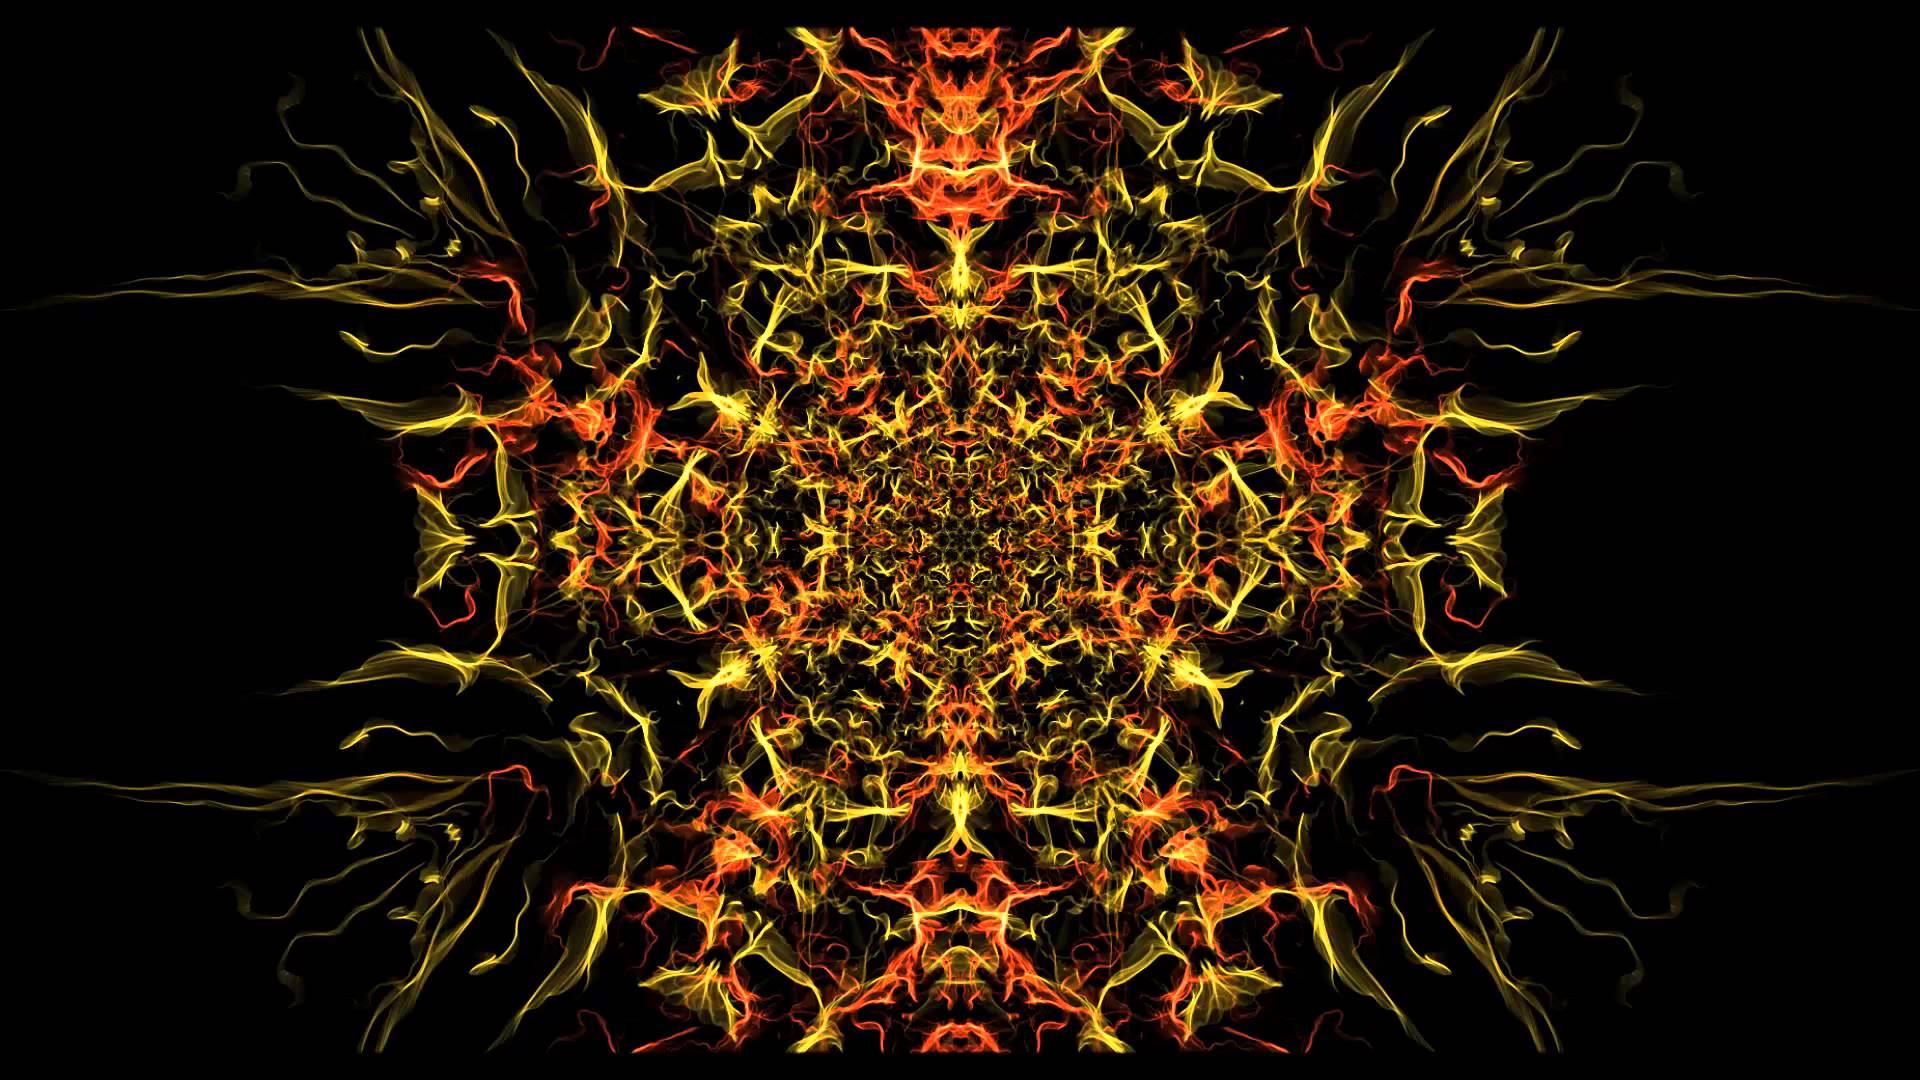 Meshuggah Bleed 10 Slower 20 Chunkier 1920x1080